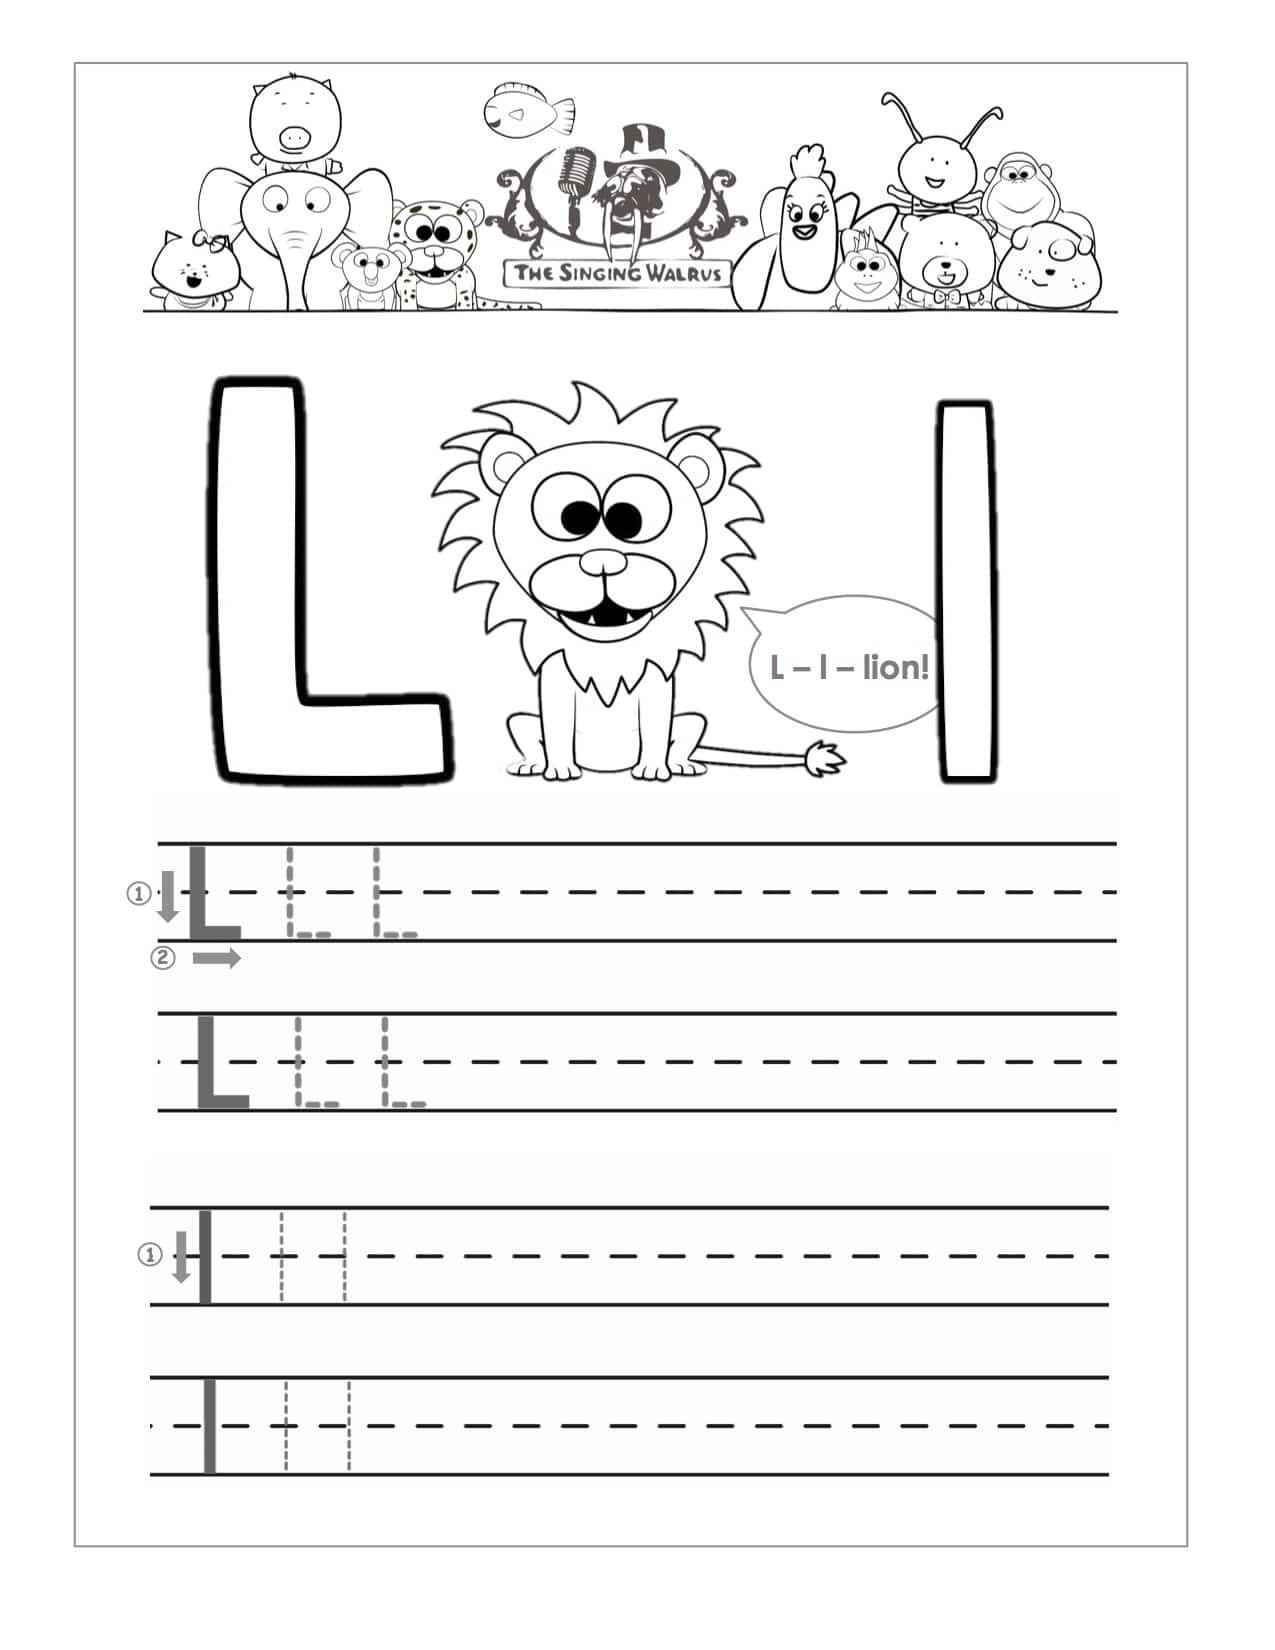 Letter L Worksheets For Preschool In 2020 Free Handwriting Worksheets Free Handwriting Handwriting Worksheets